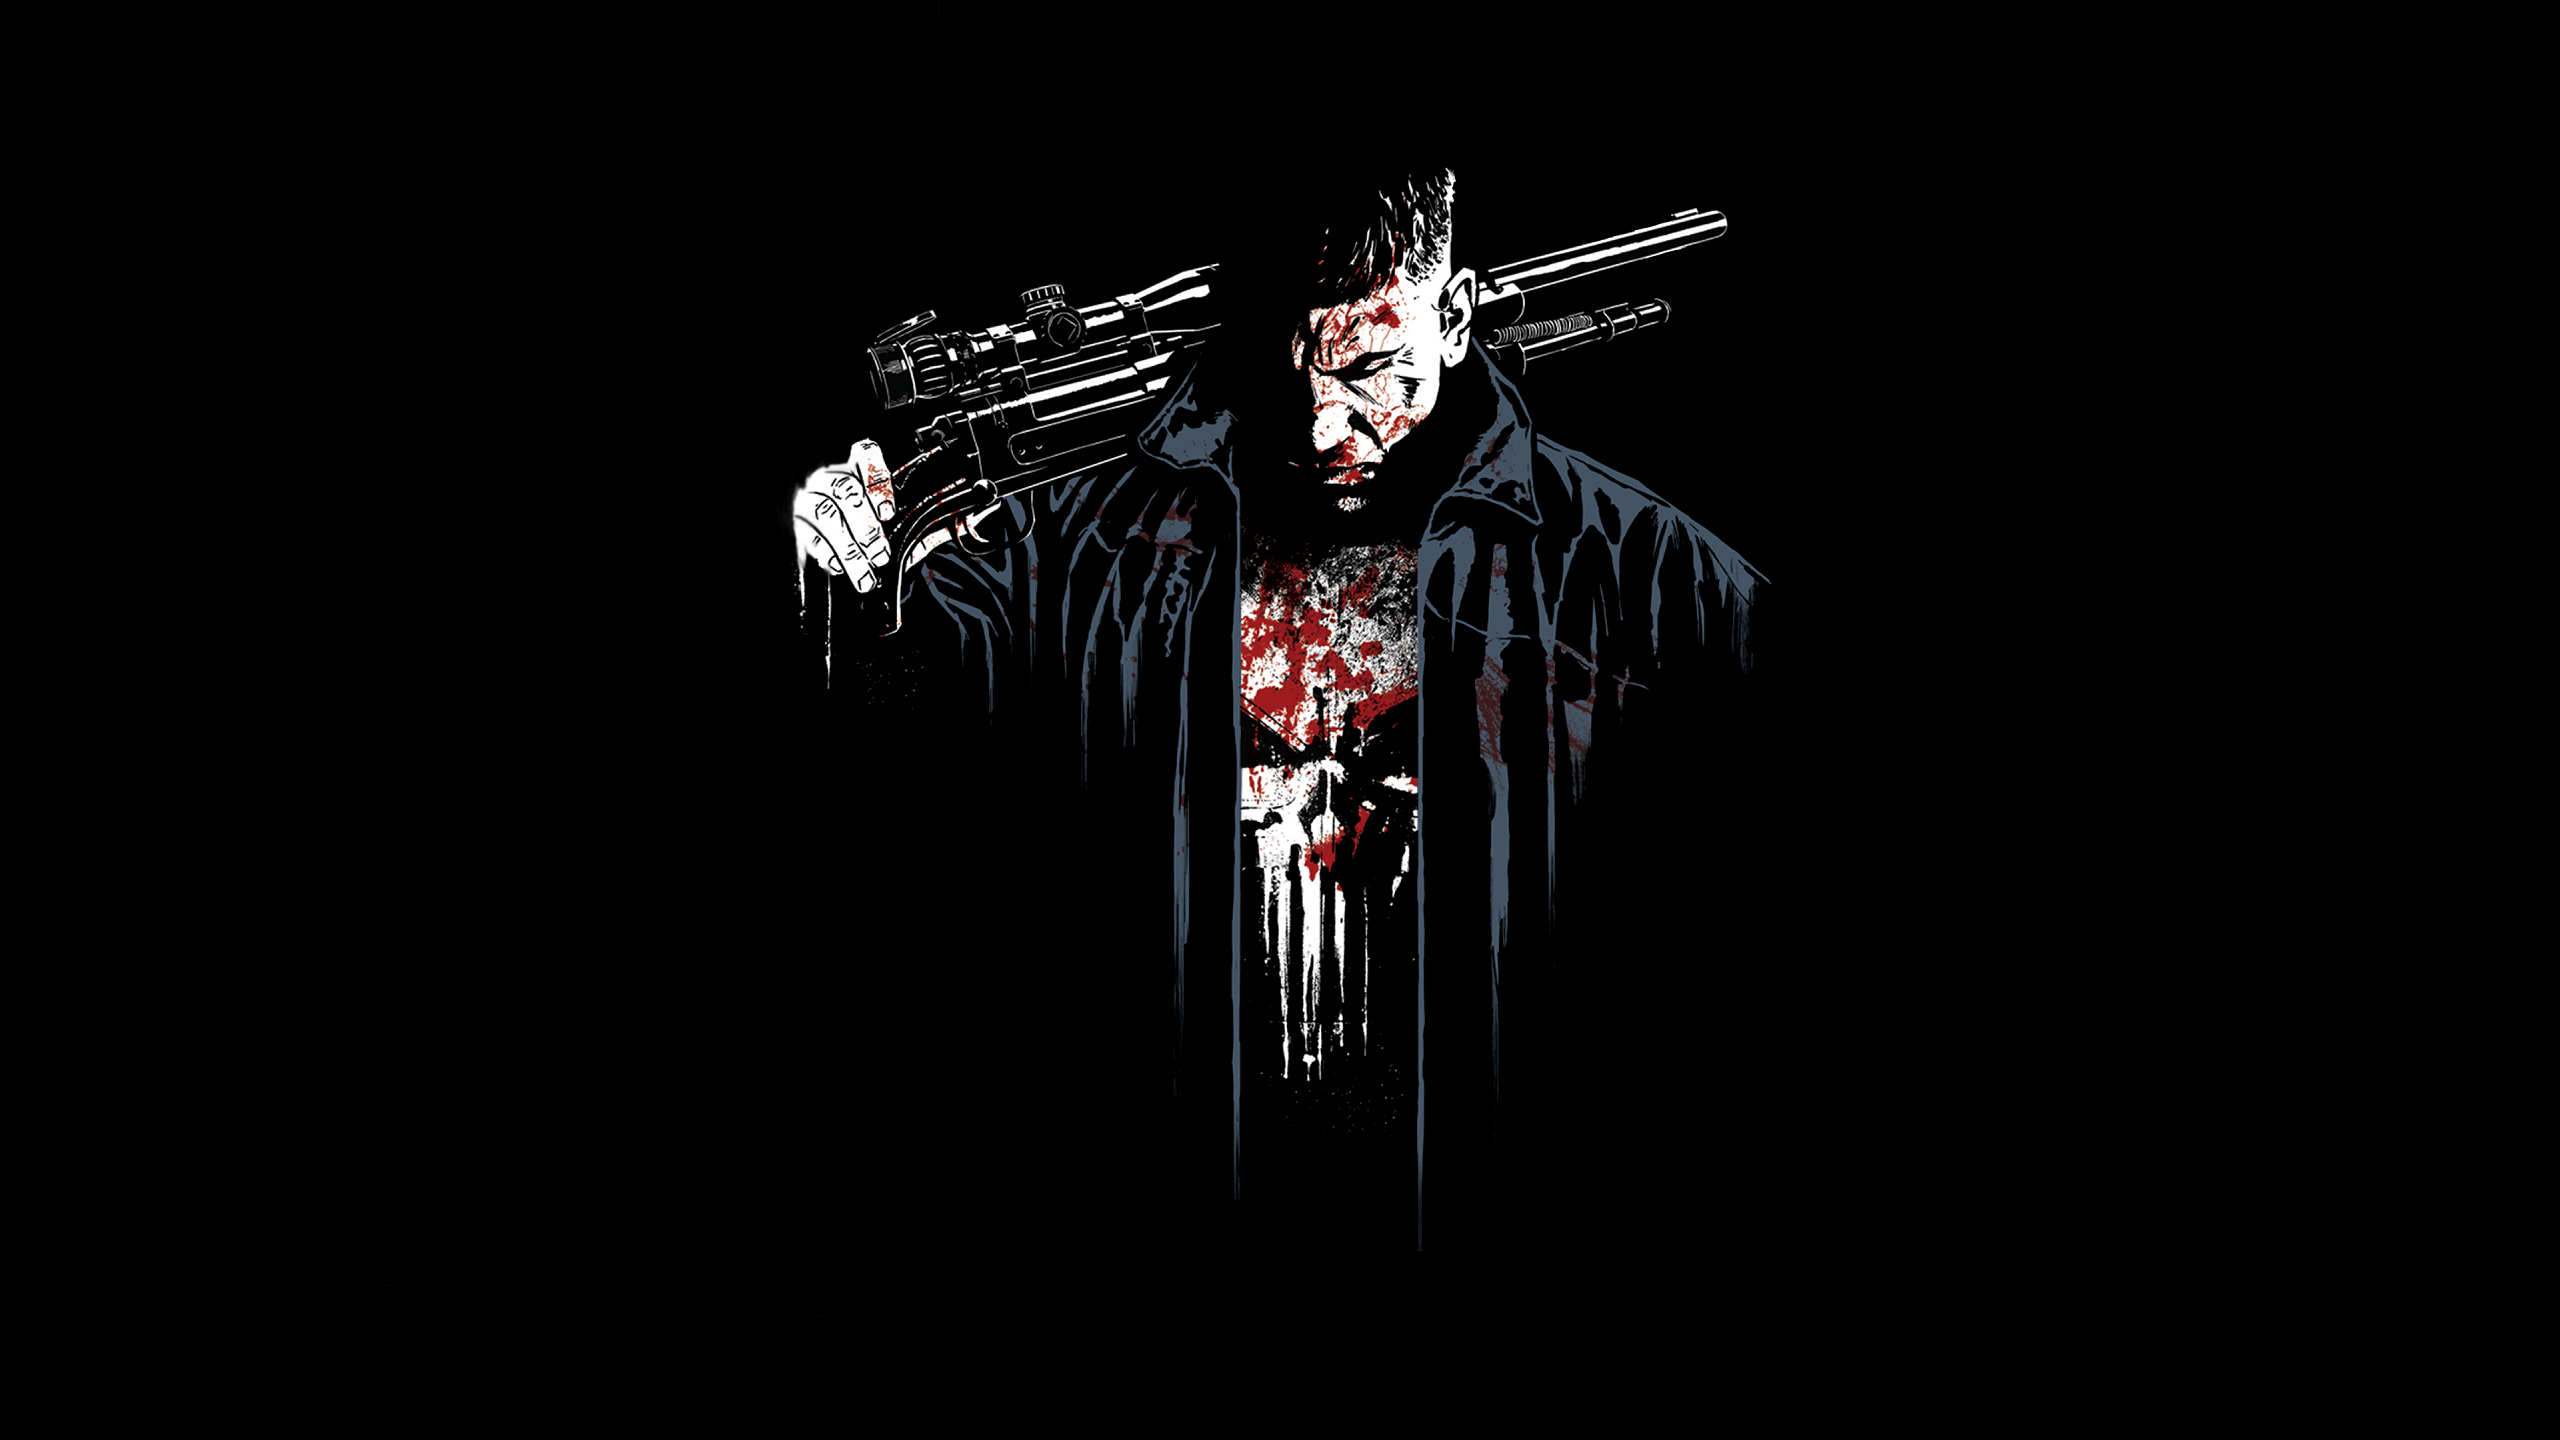 The Punisher Fondo De Pantalla Hd Fondo De Escritorio